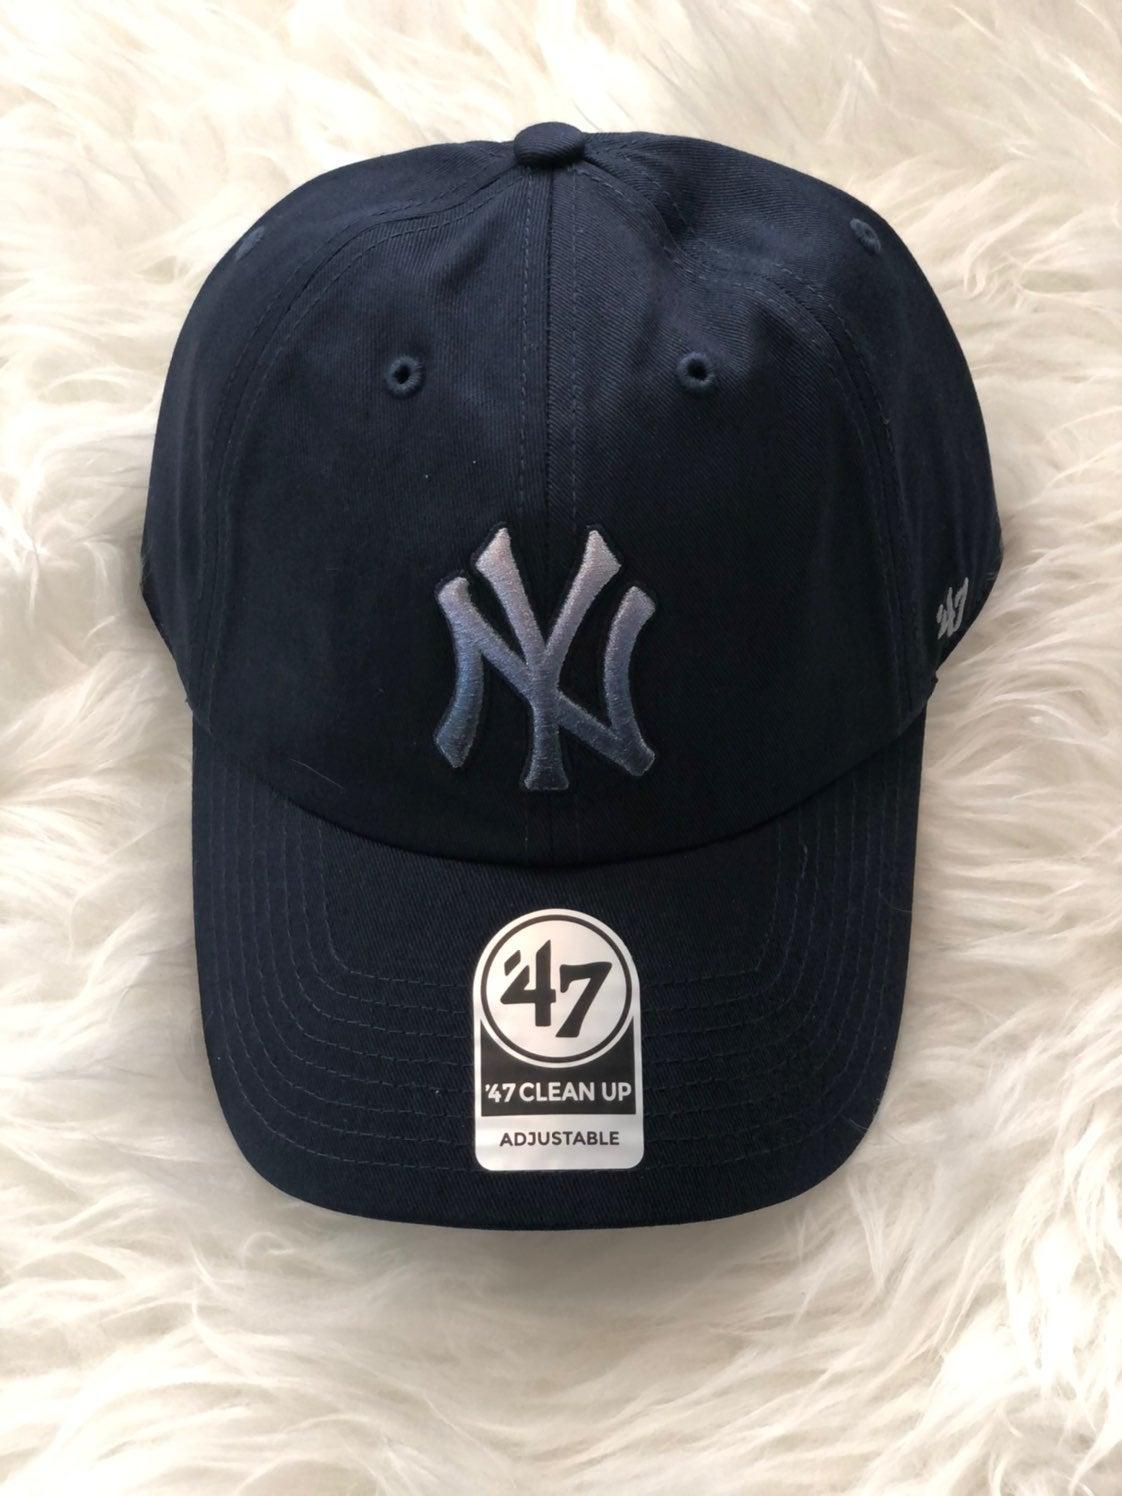 47 NEW YORK YANKEES FALTON CAP - NAVY